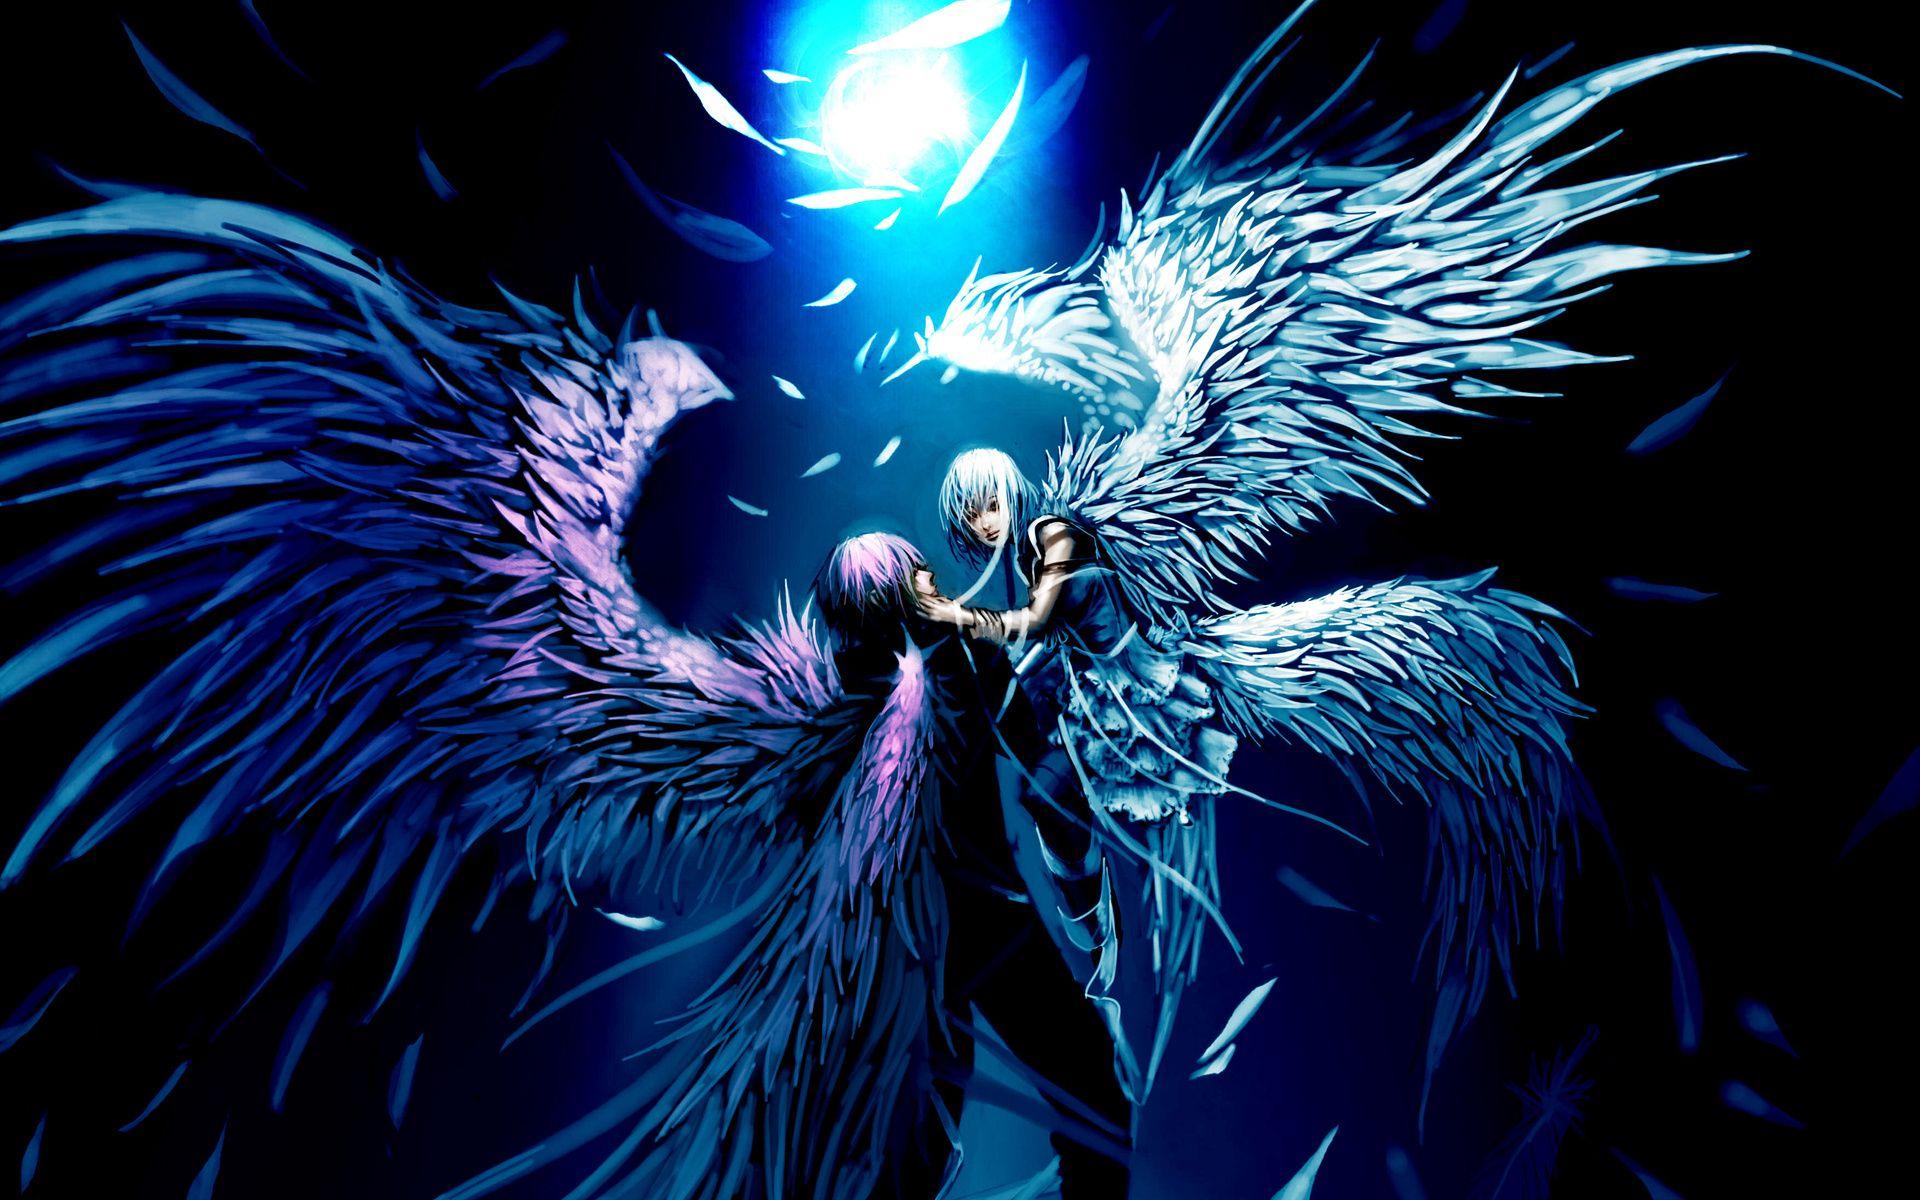 Amazing anime backgrounds flight sad sorrow artistic art embrace feathers wallpaper background